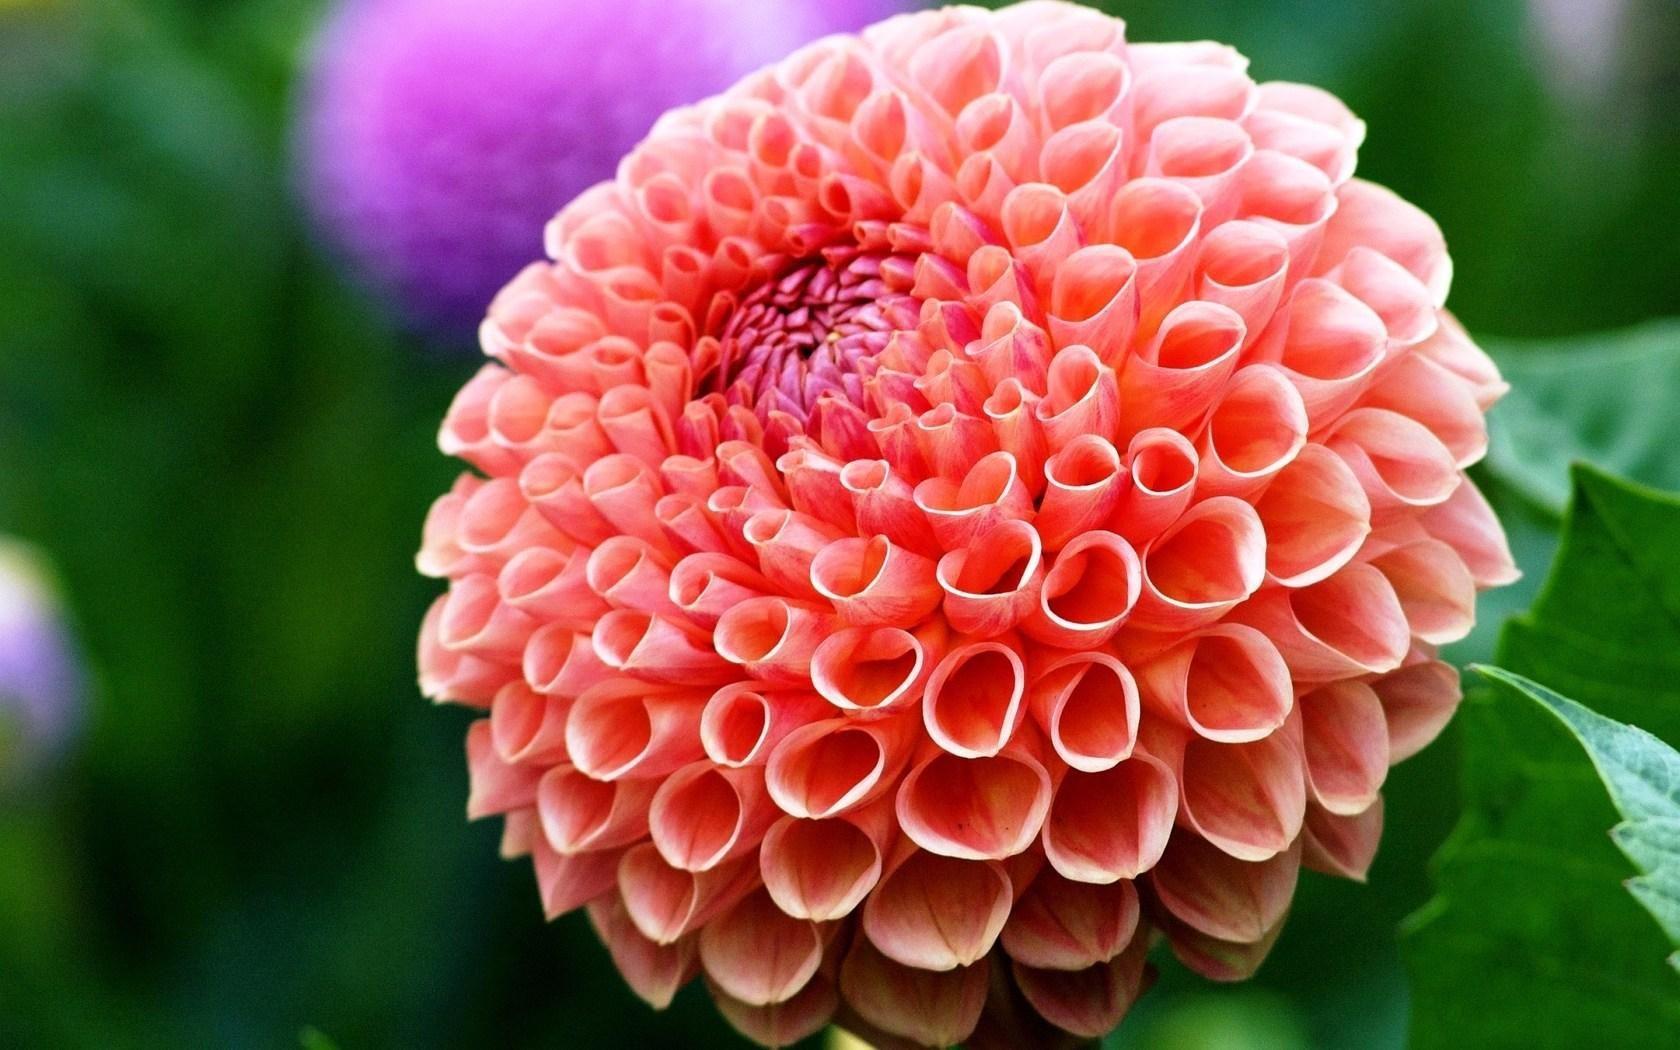 Image Result For 1600x900 Hd Dahlia Wallpaper Dahlia Flower Flower Pot Garden Flower Beauty